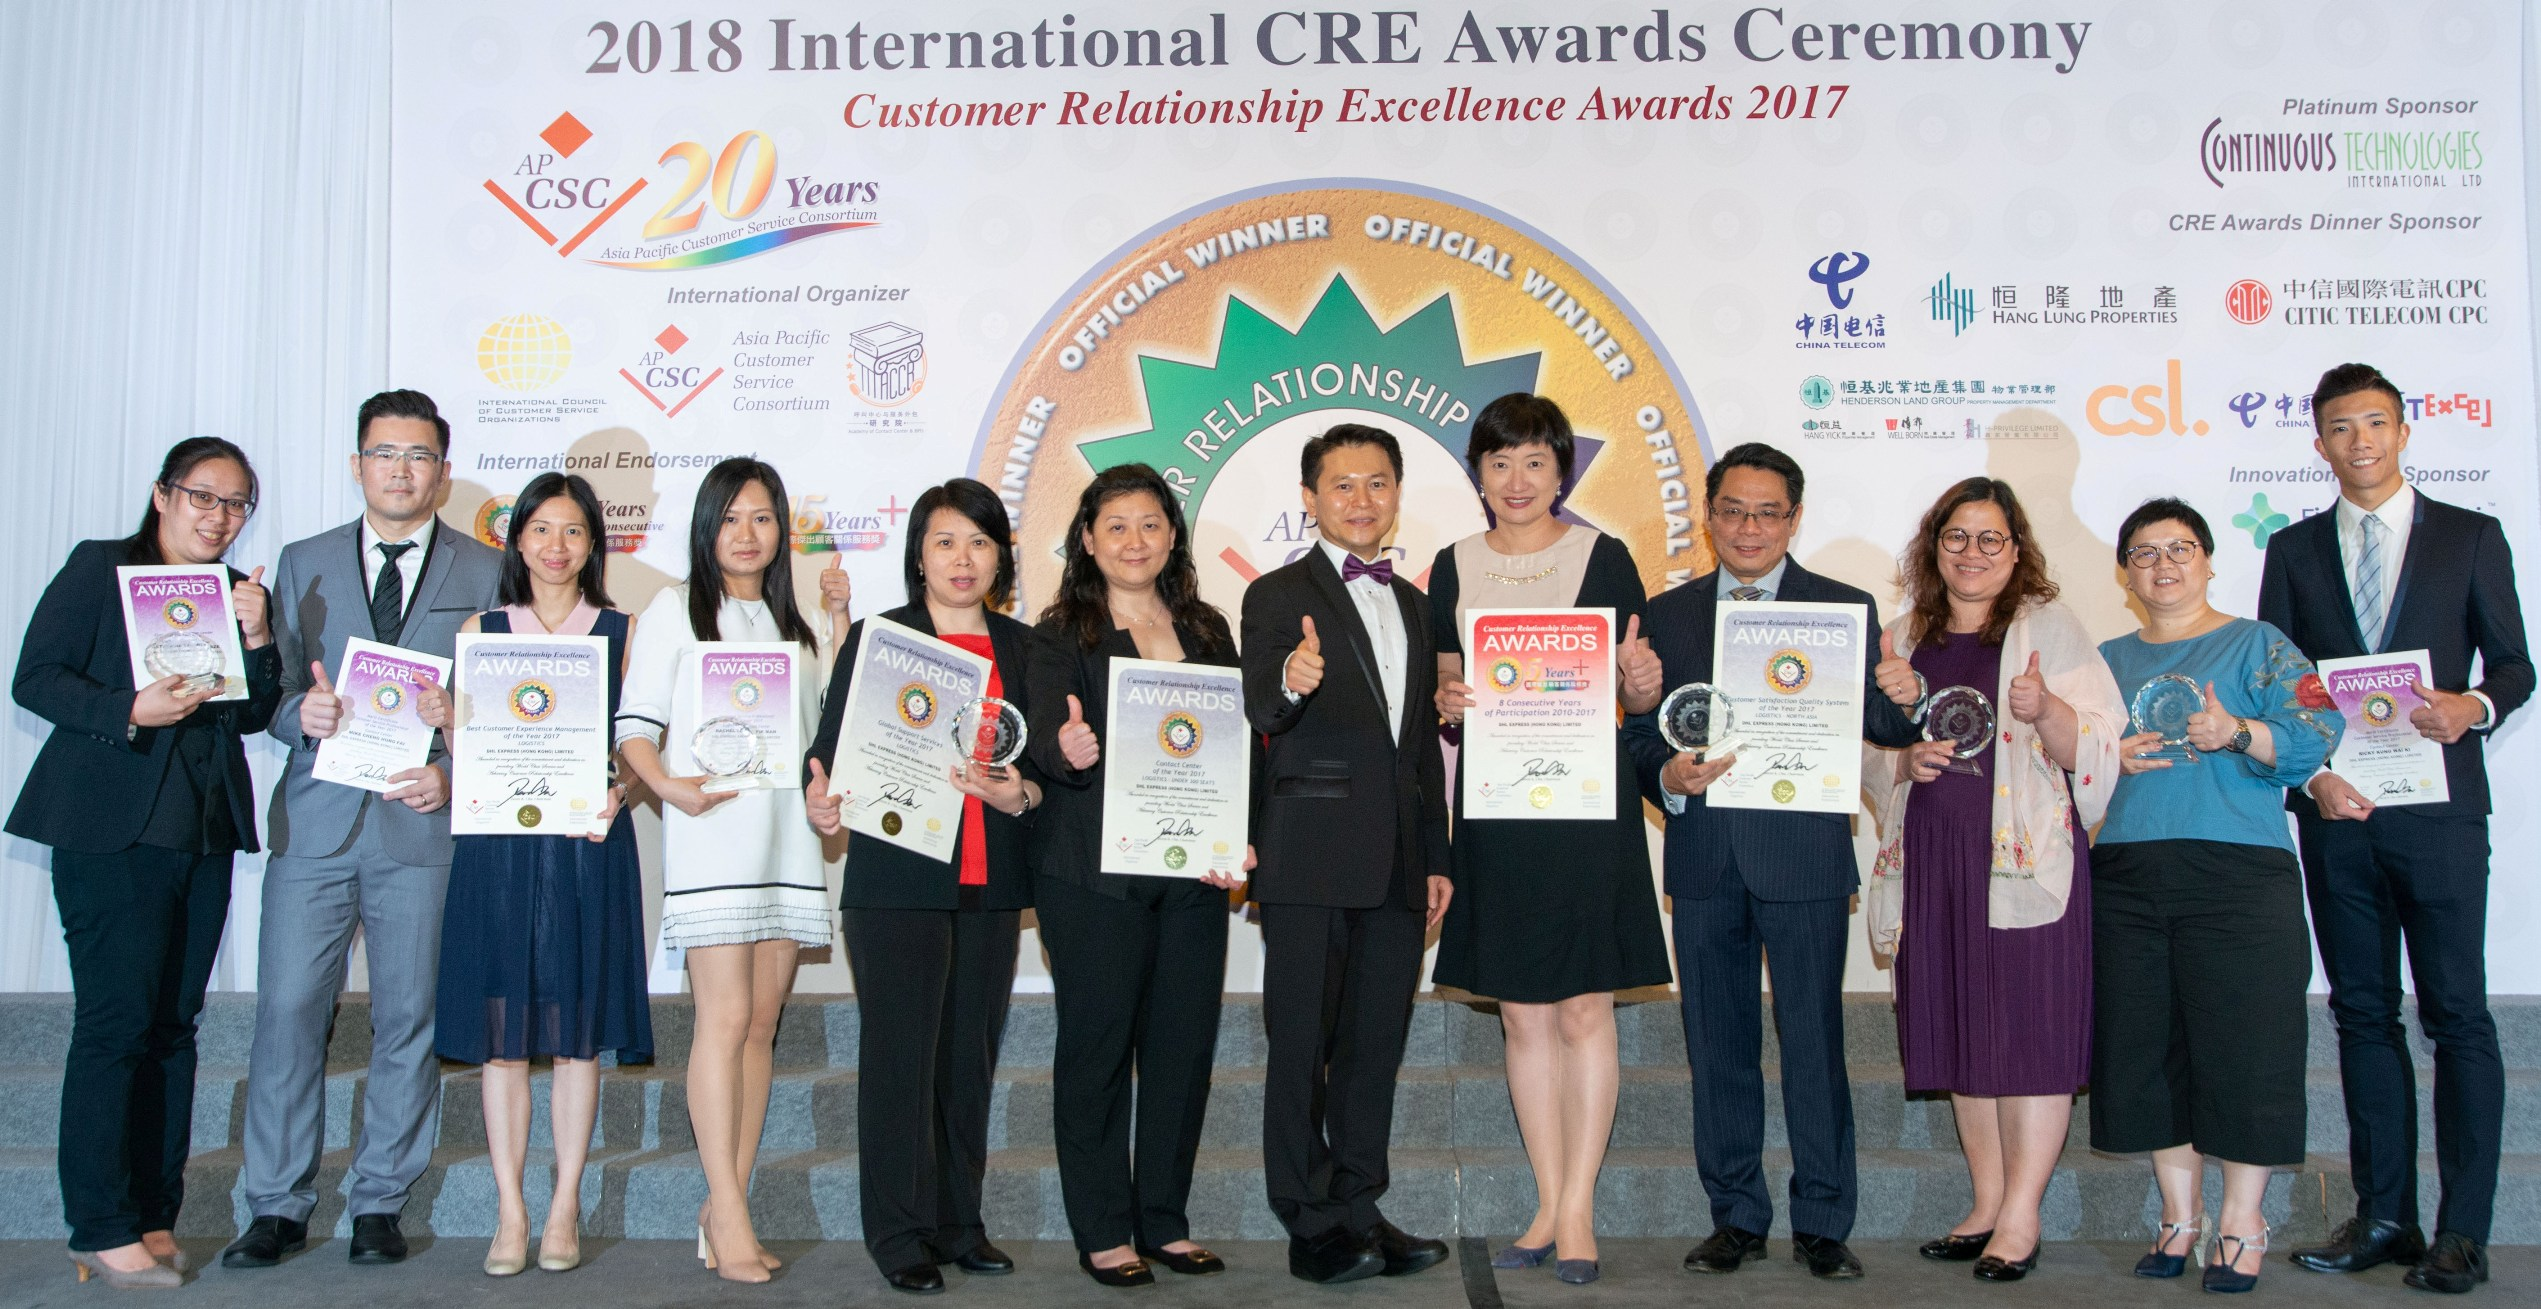 Asia Pacific Customer Service Consortium